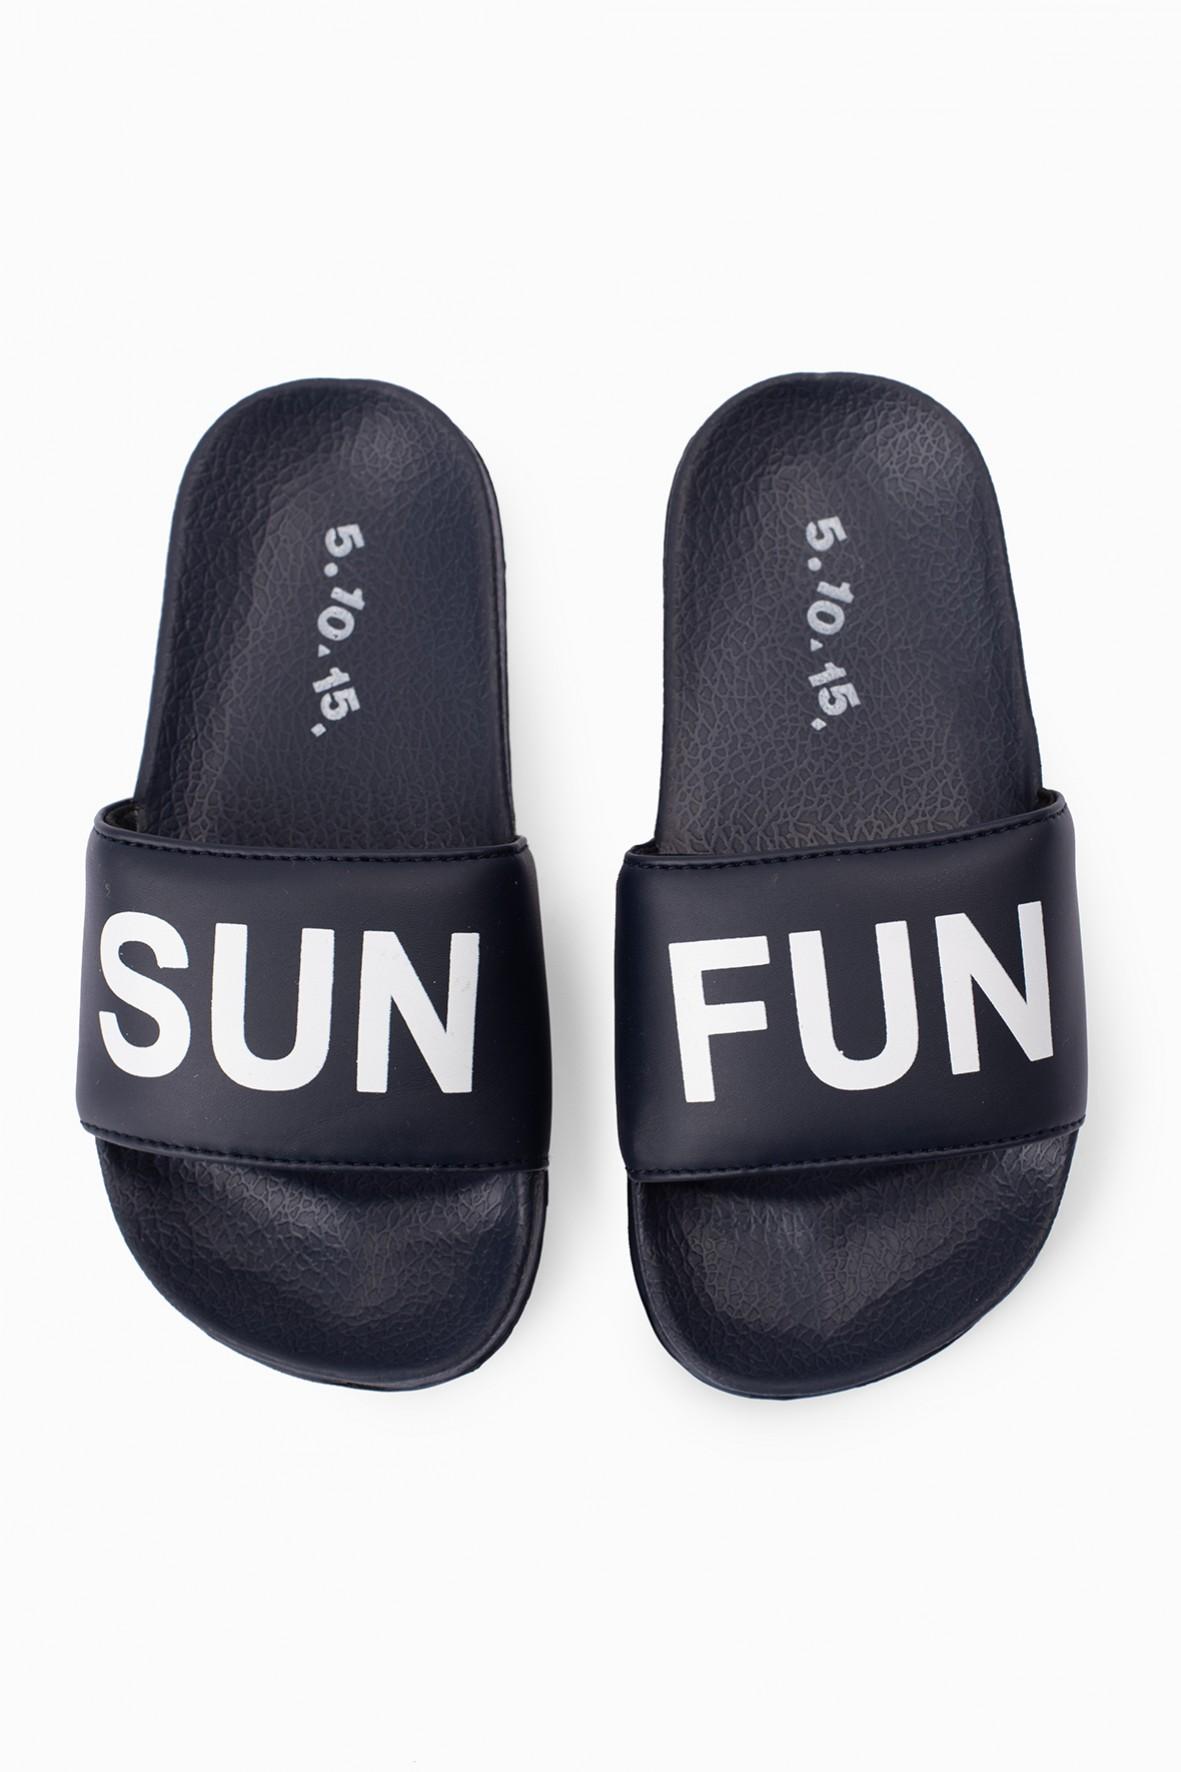 Granatowe klapki dla dziecka Sun Fun